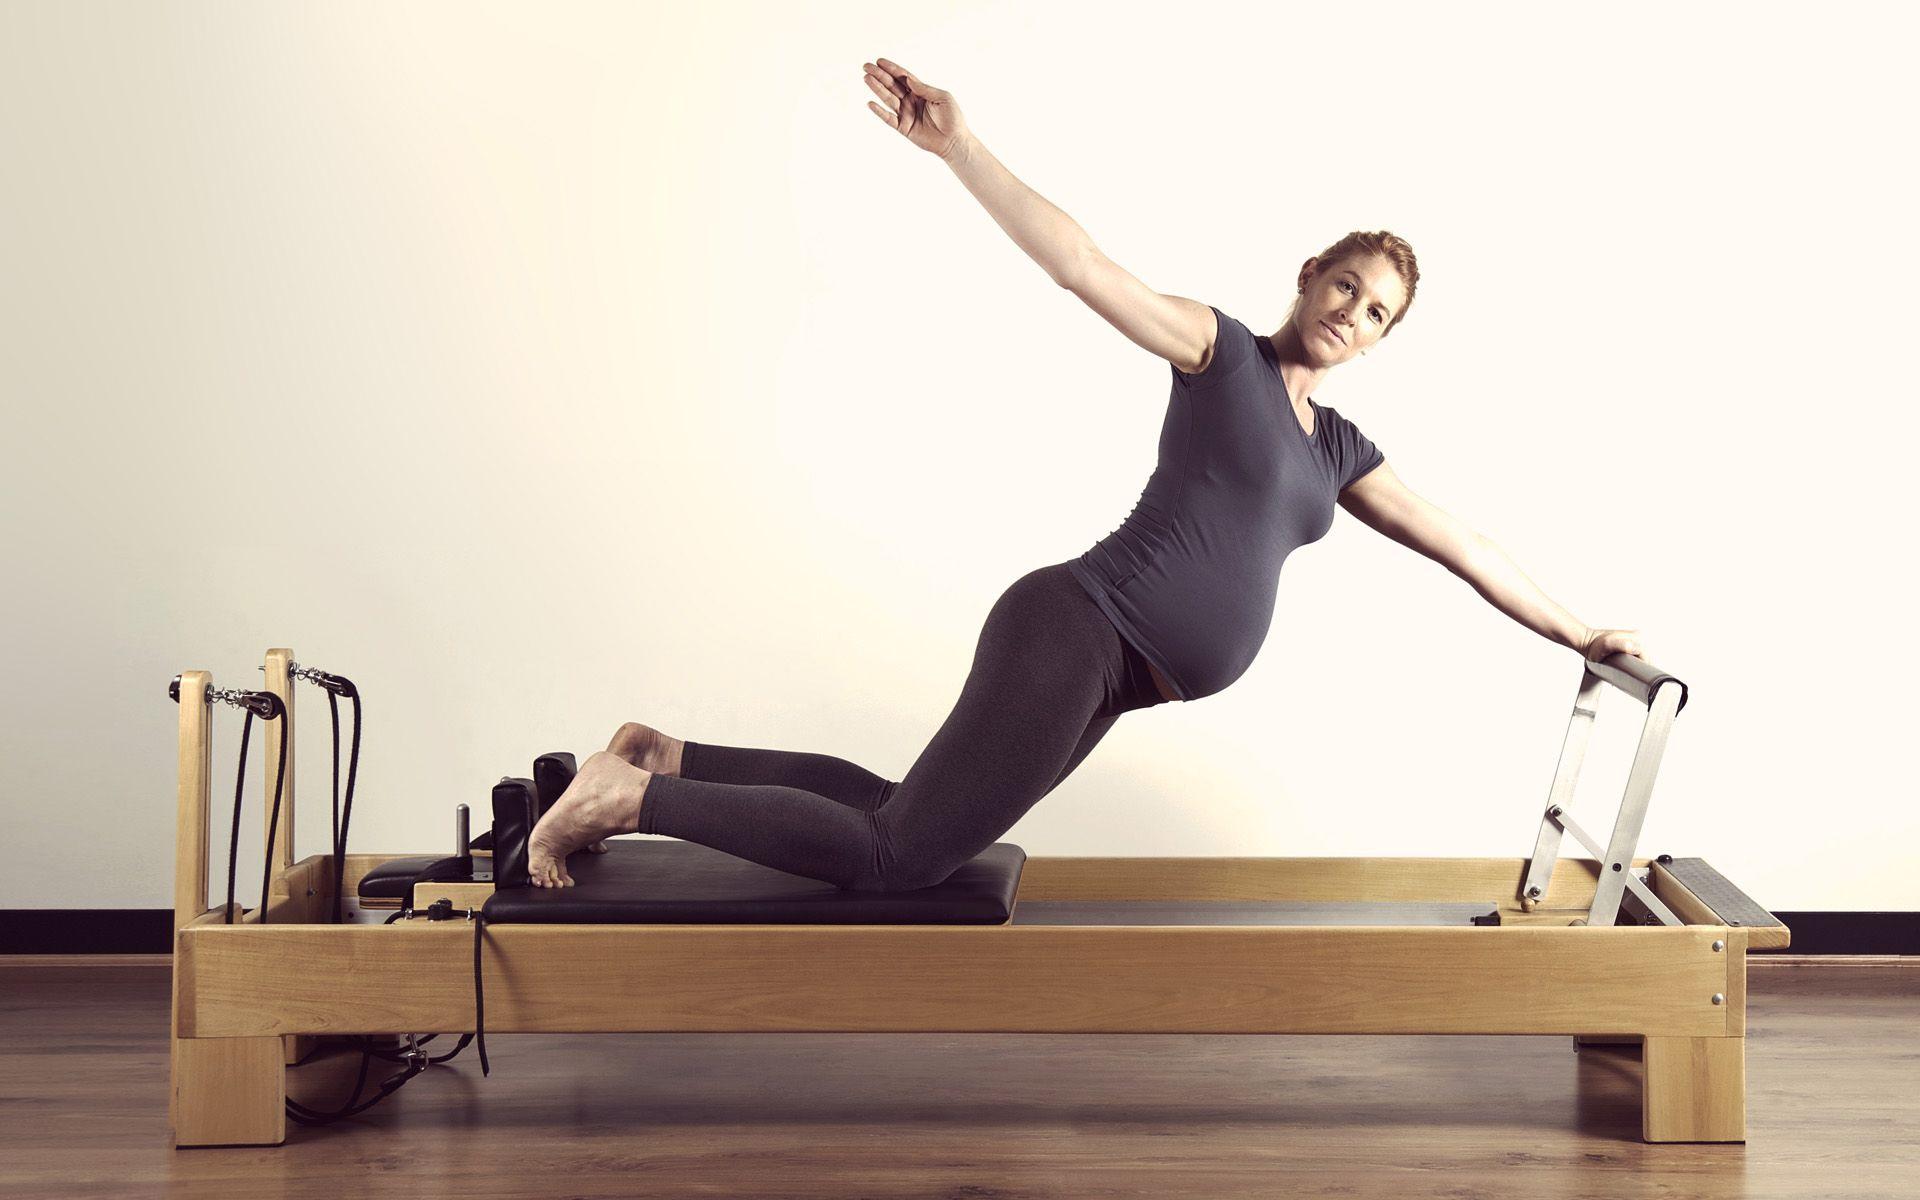 Reformer Pilates during pregnancy